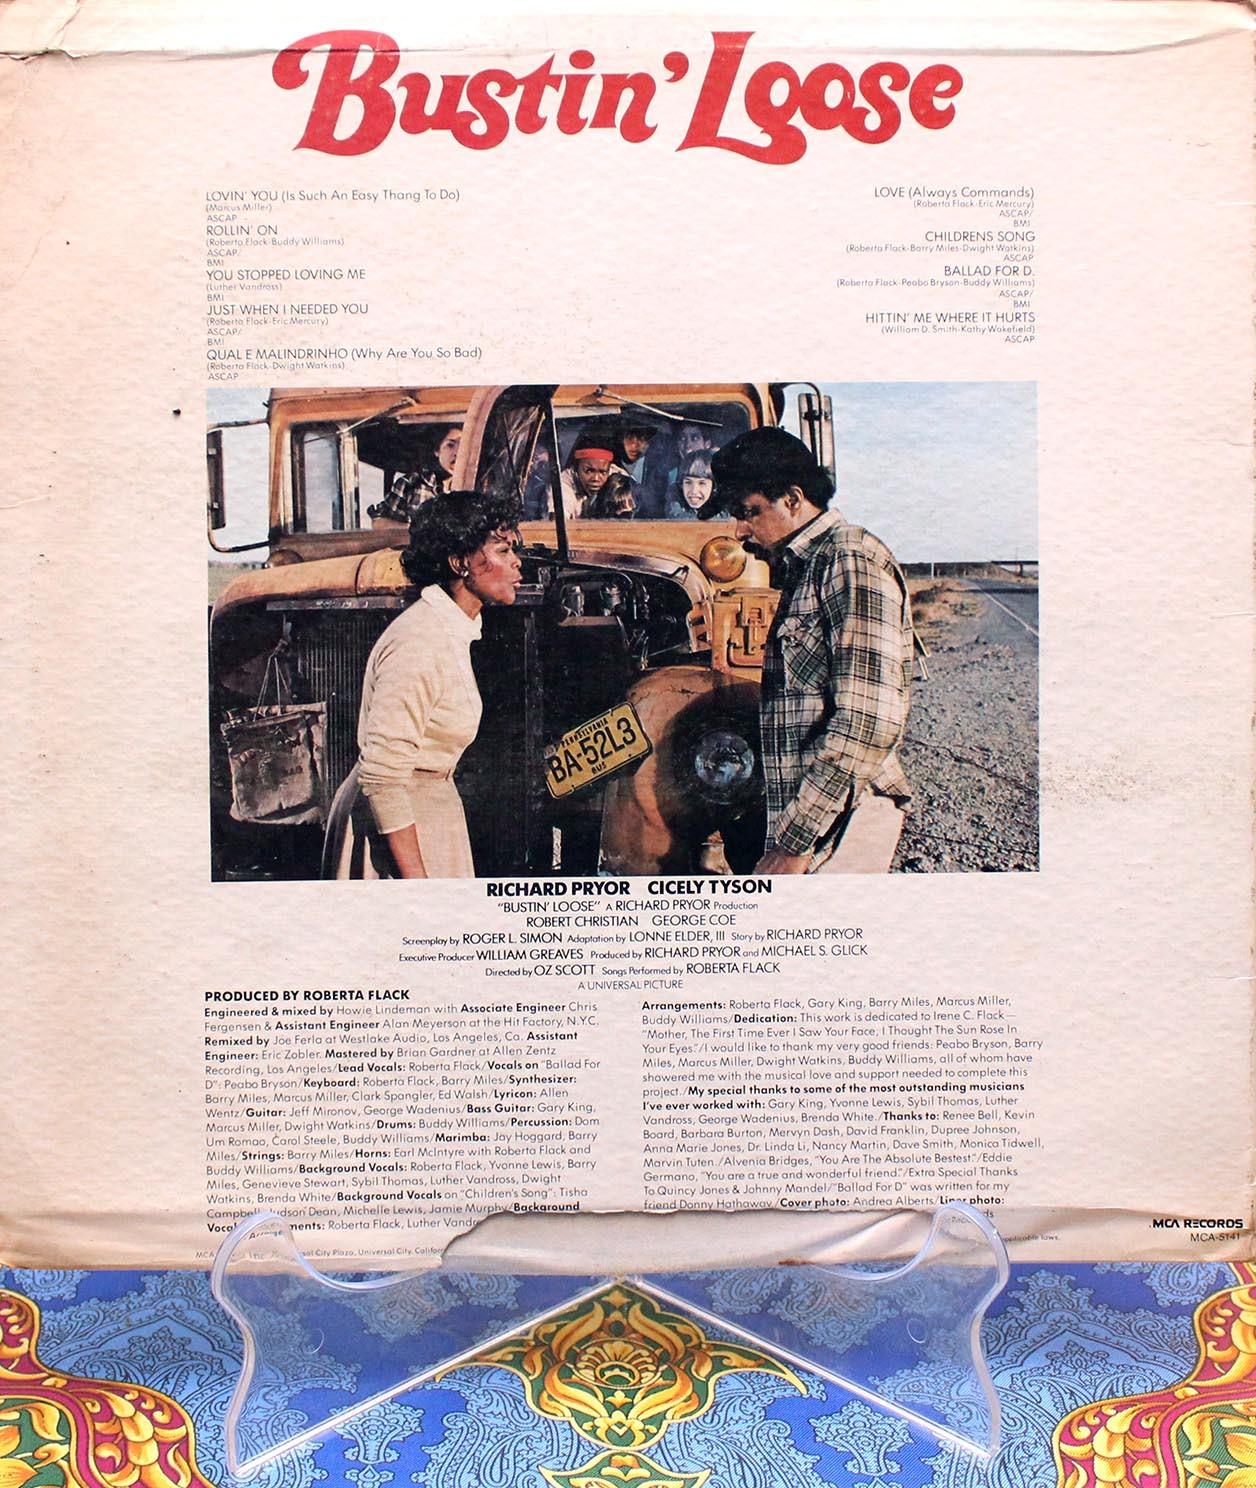 Roberta Flack Bustin loose 02